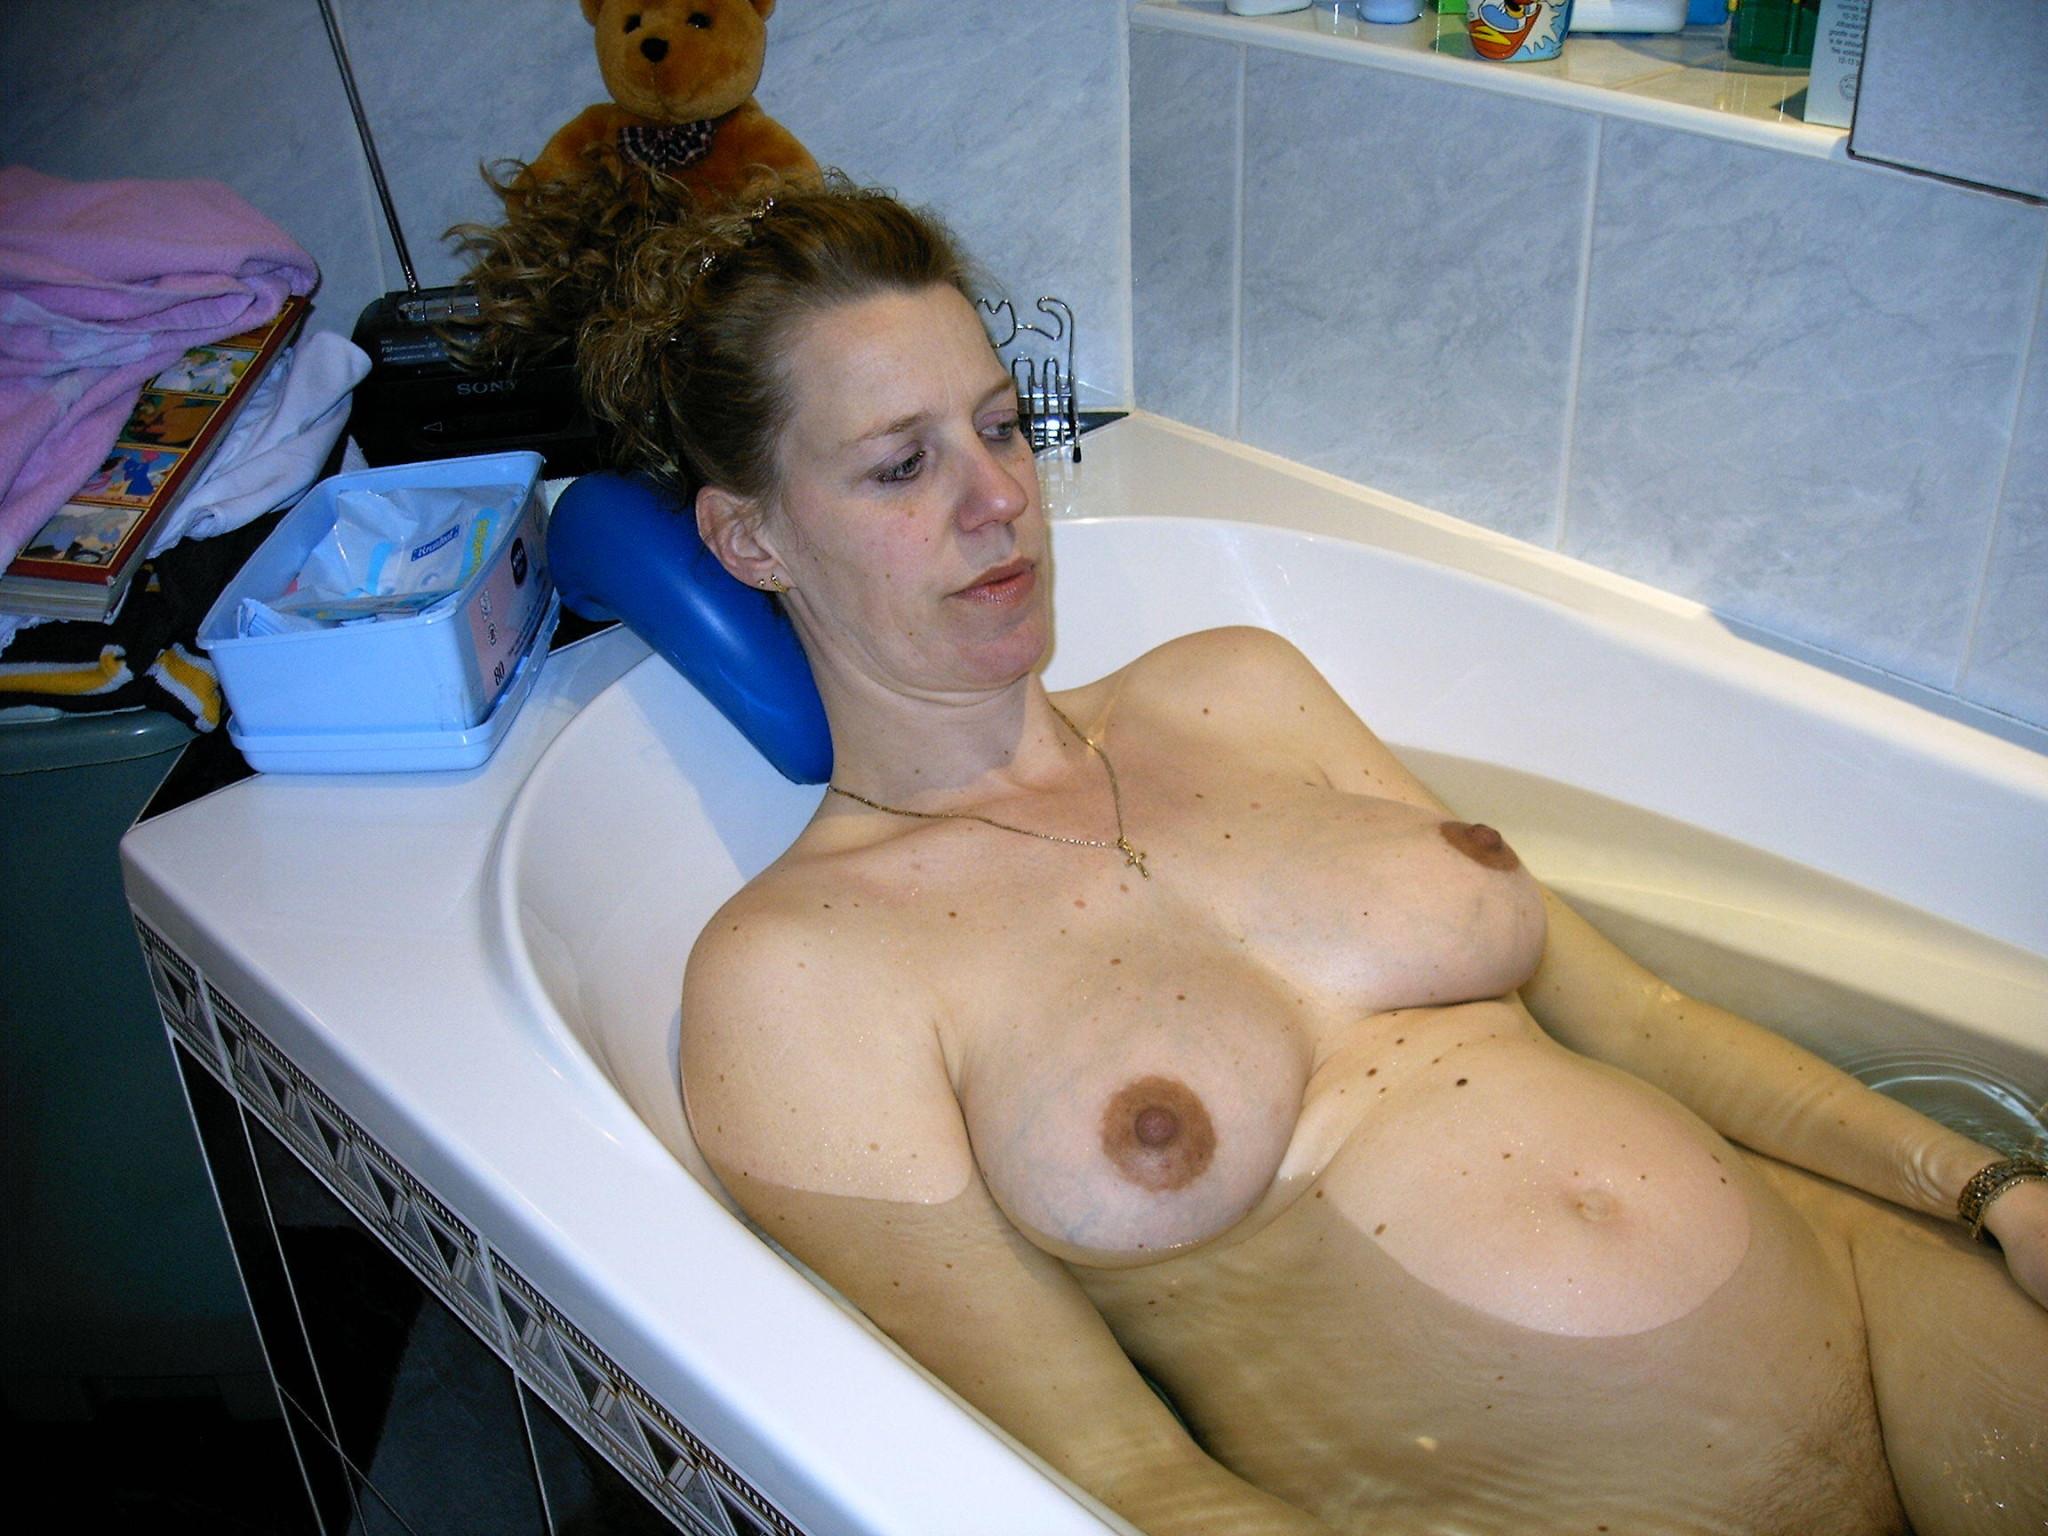 Sexy, Uncensored Postpartum Body Boudoir Photos Sheknows